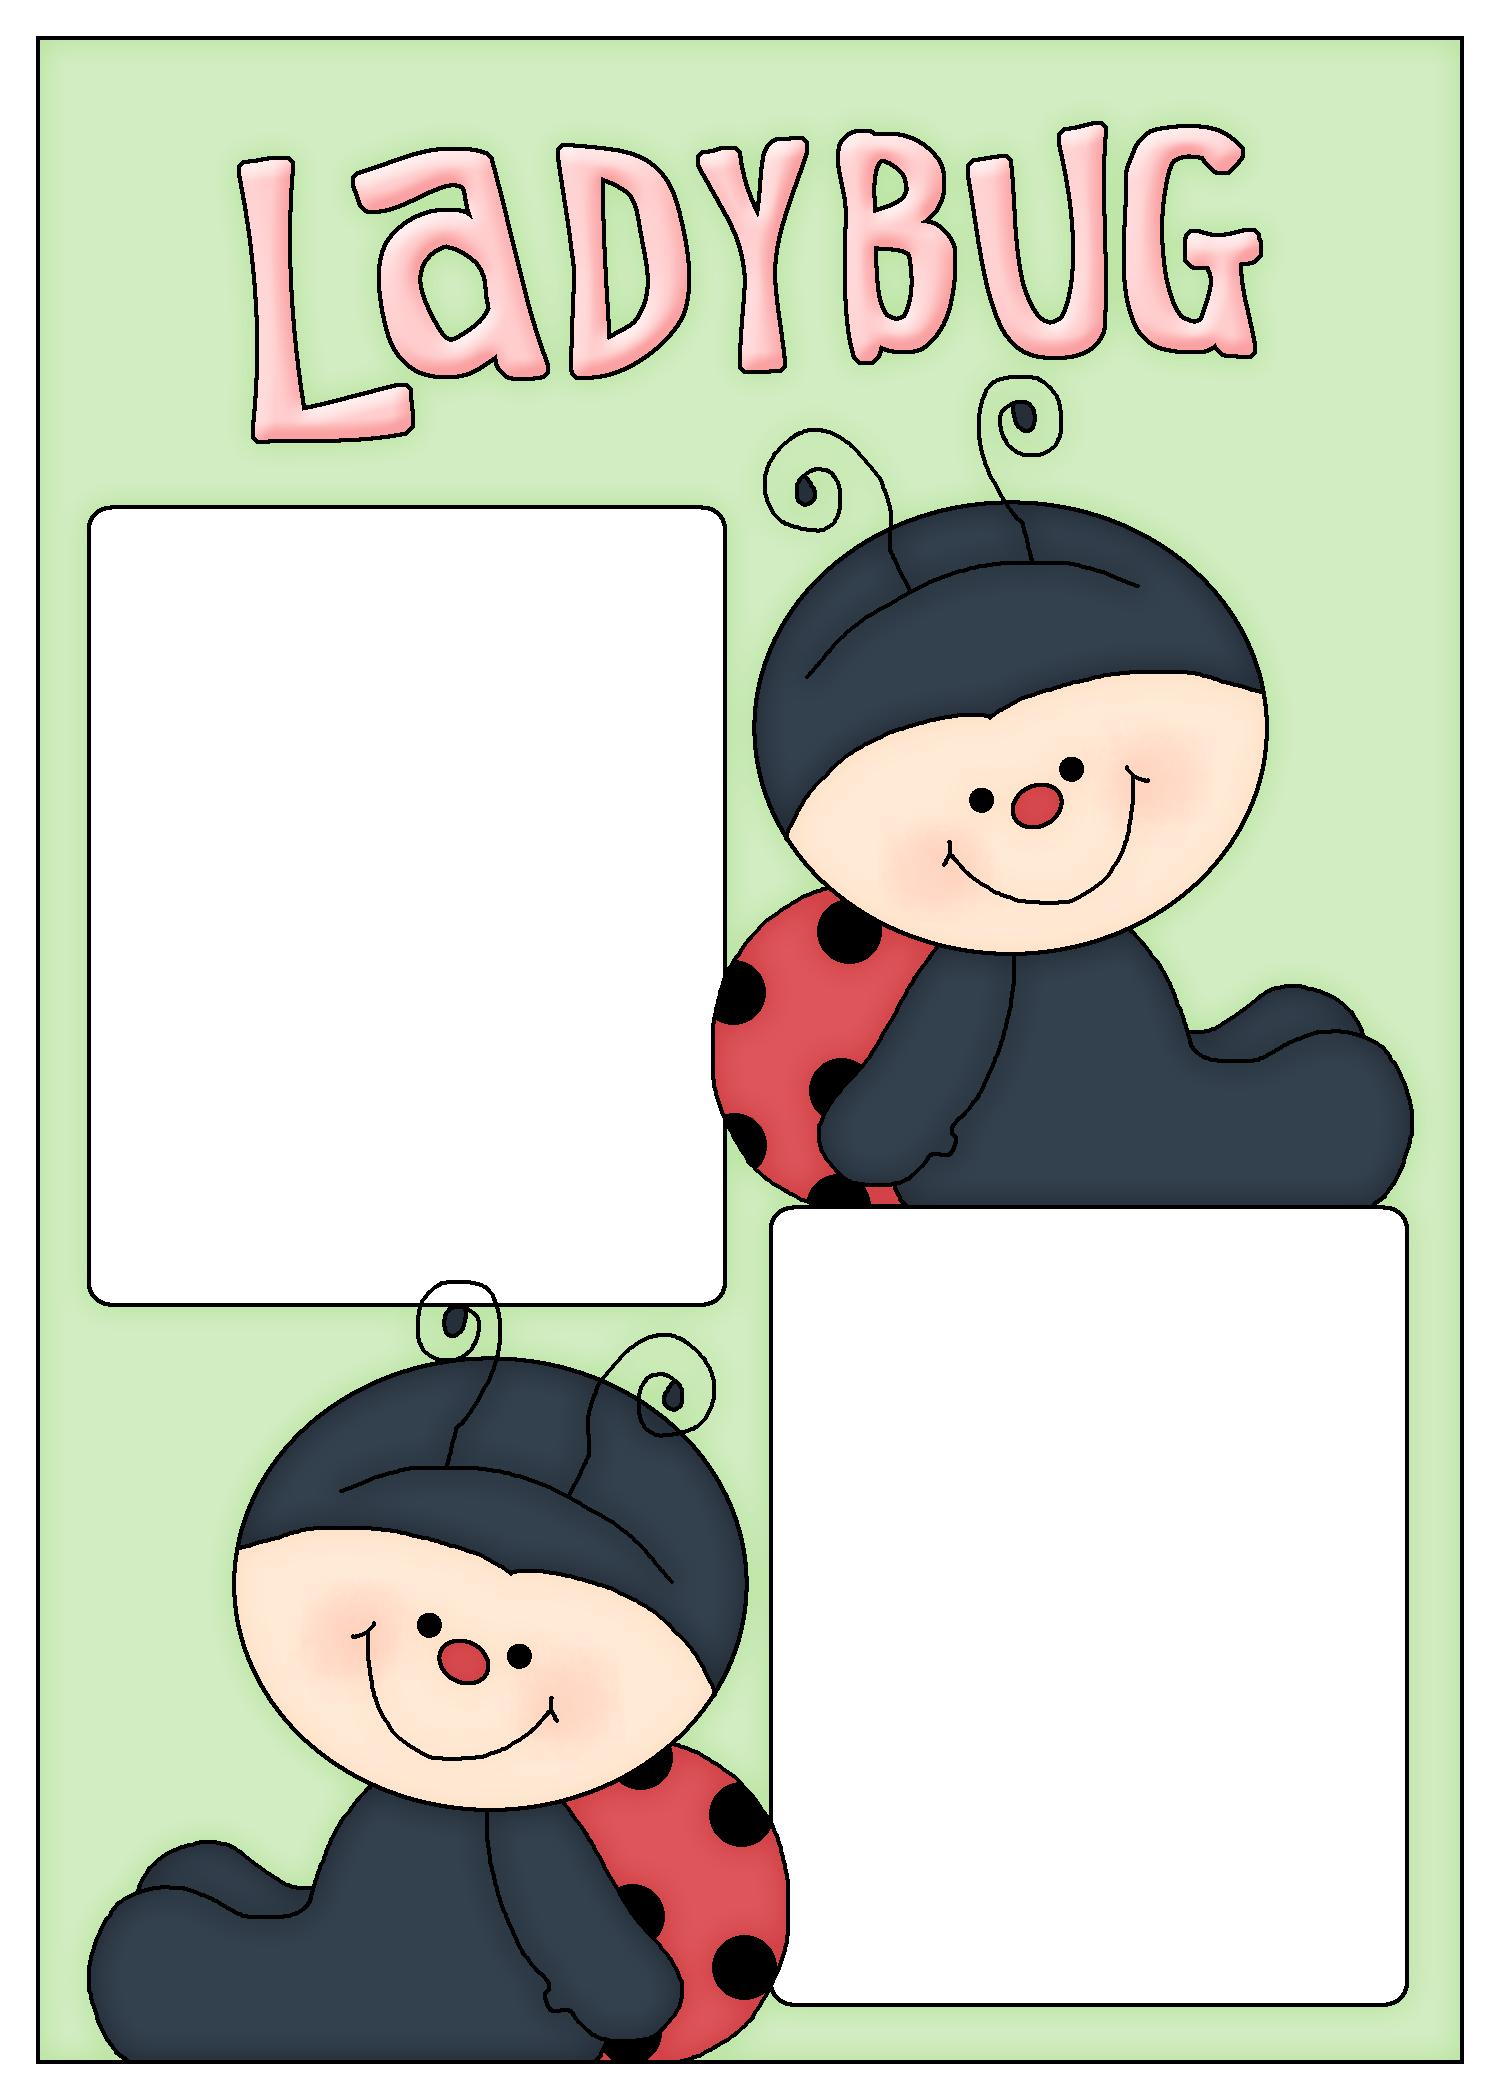 Frames lady bugs pinterest. Ladybug clipart let's celebrate